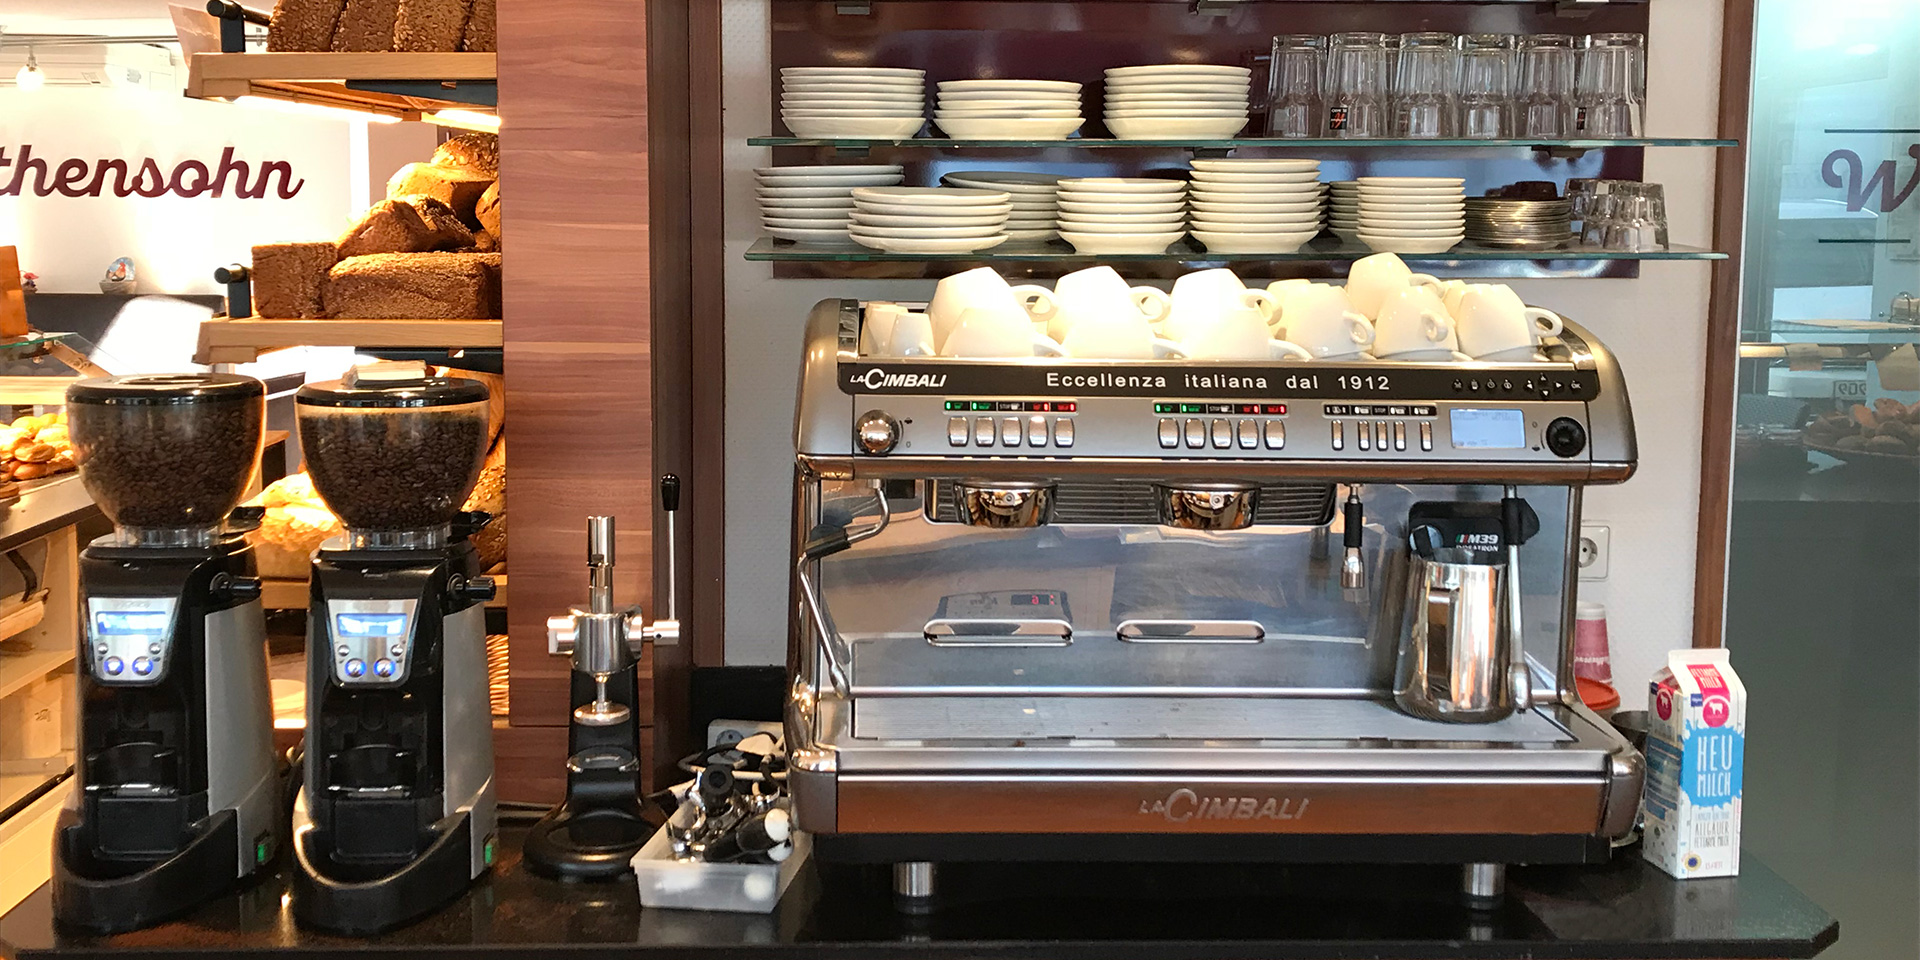 Wirthensohn Backwerkstatt Espressomaschine